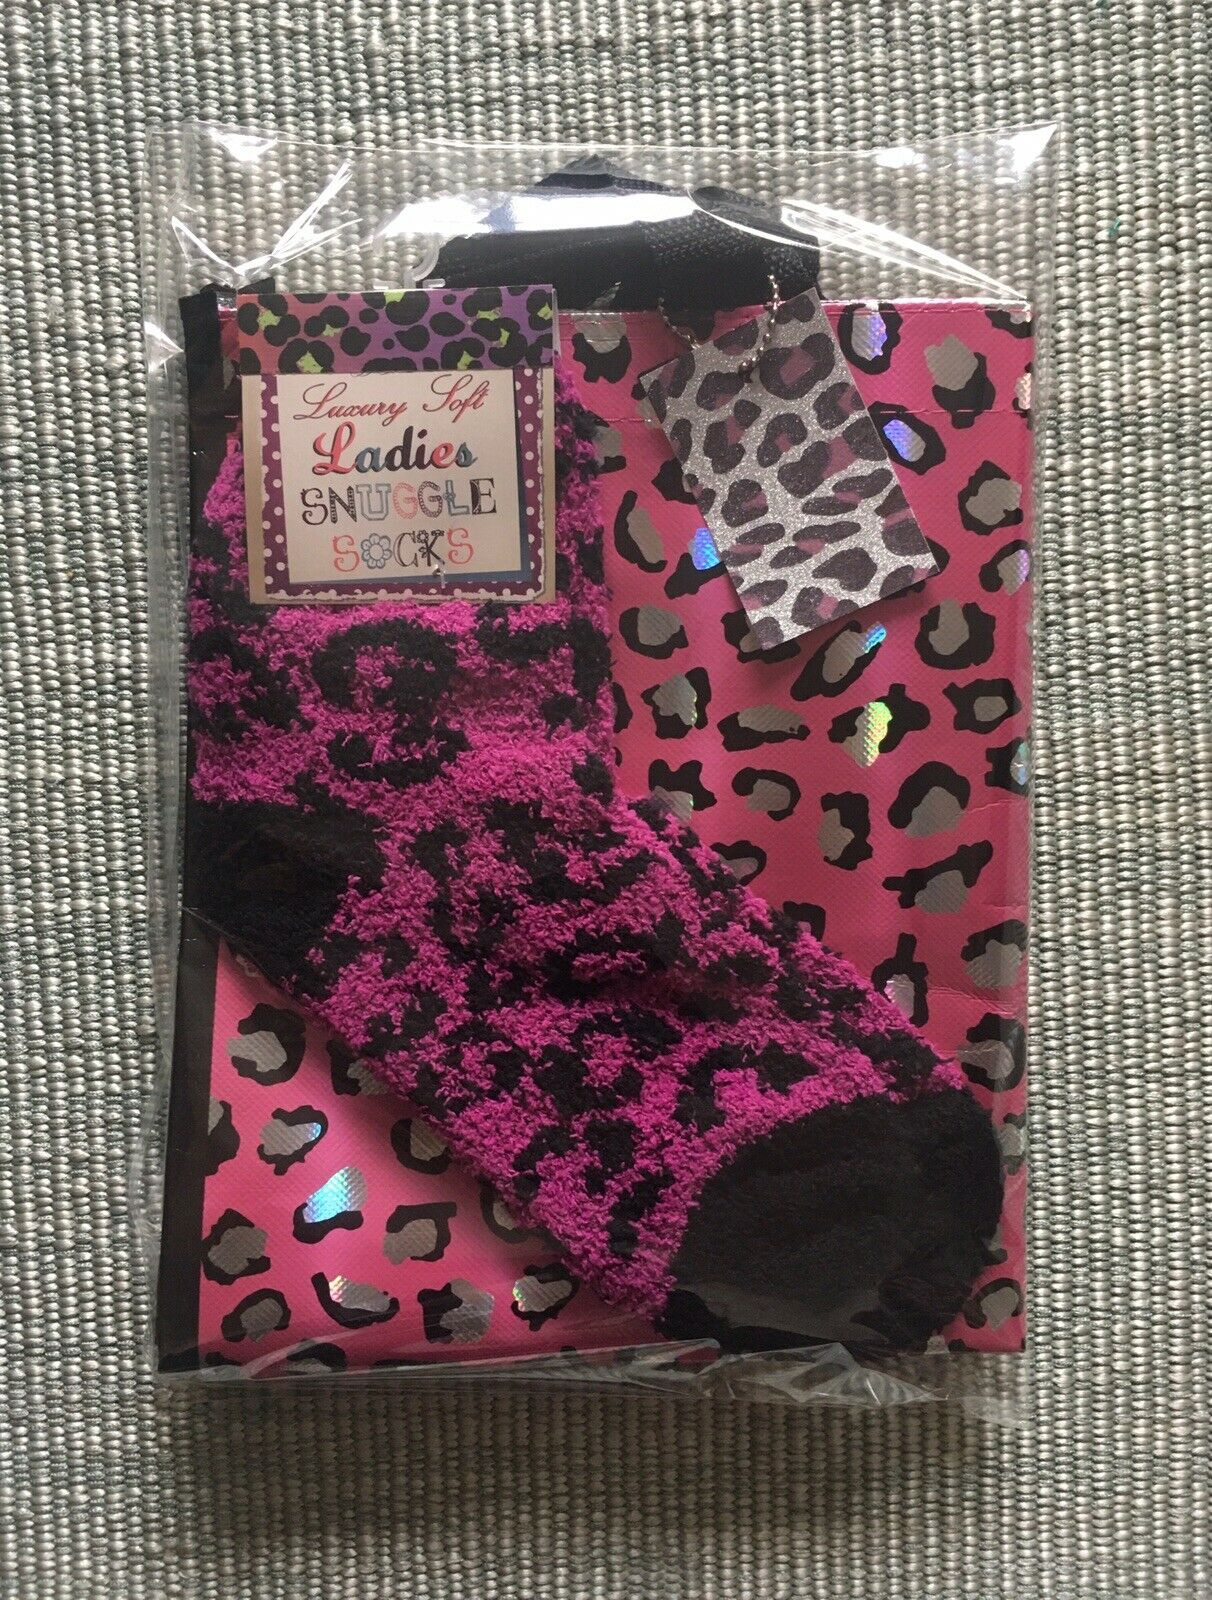 Retro rockabilly Pink Leopard Print Tote Bag +fluffy Lounge Socks 2pc Gift Set